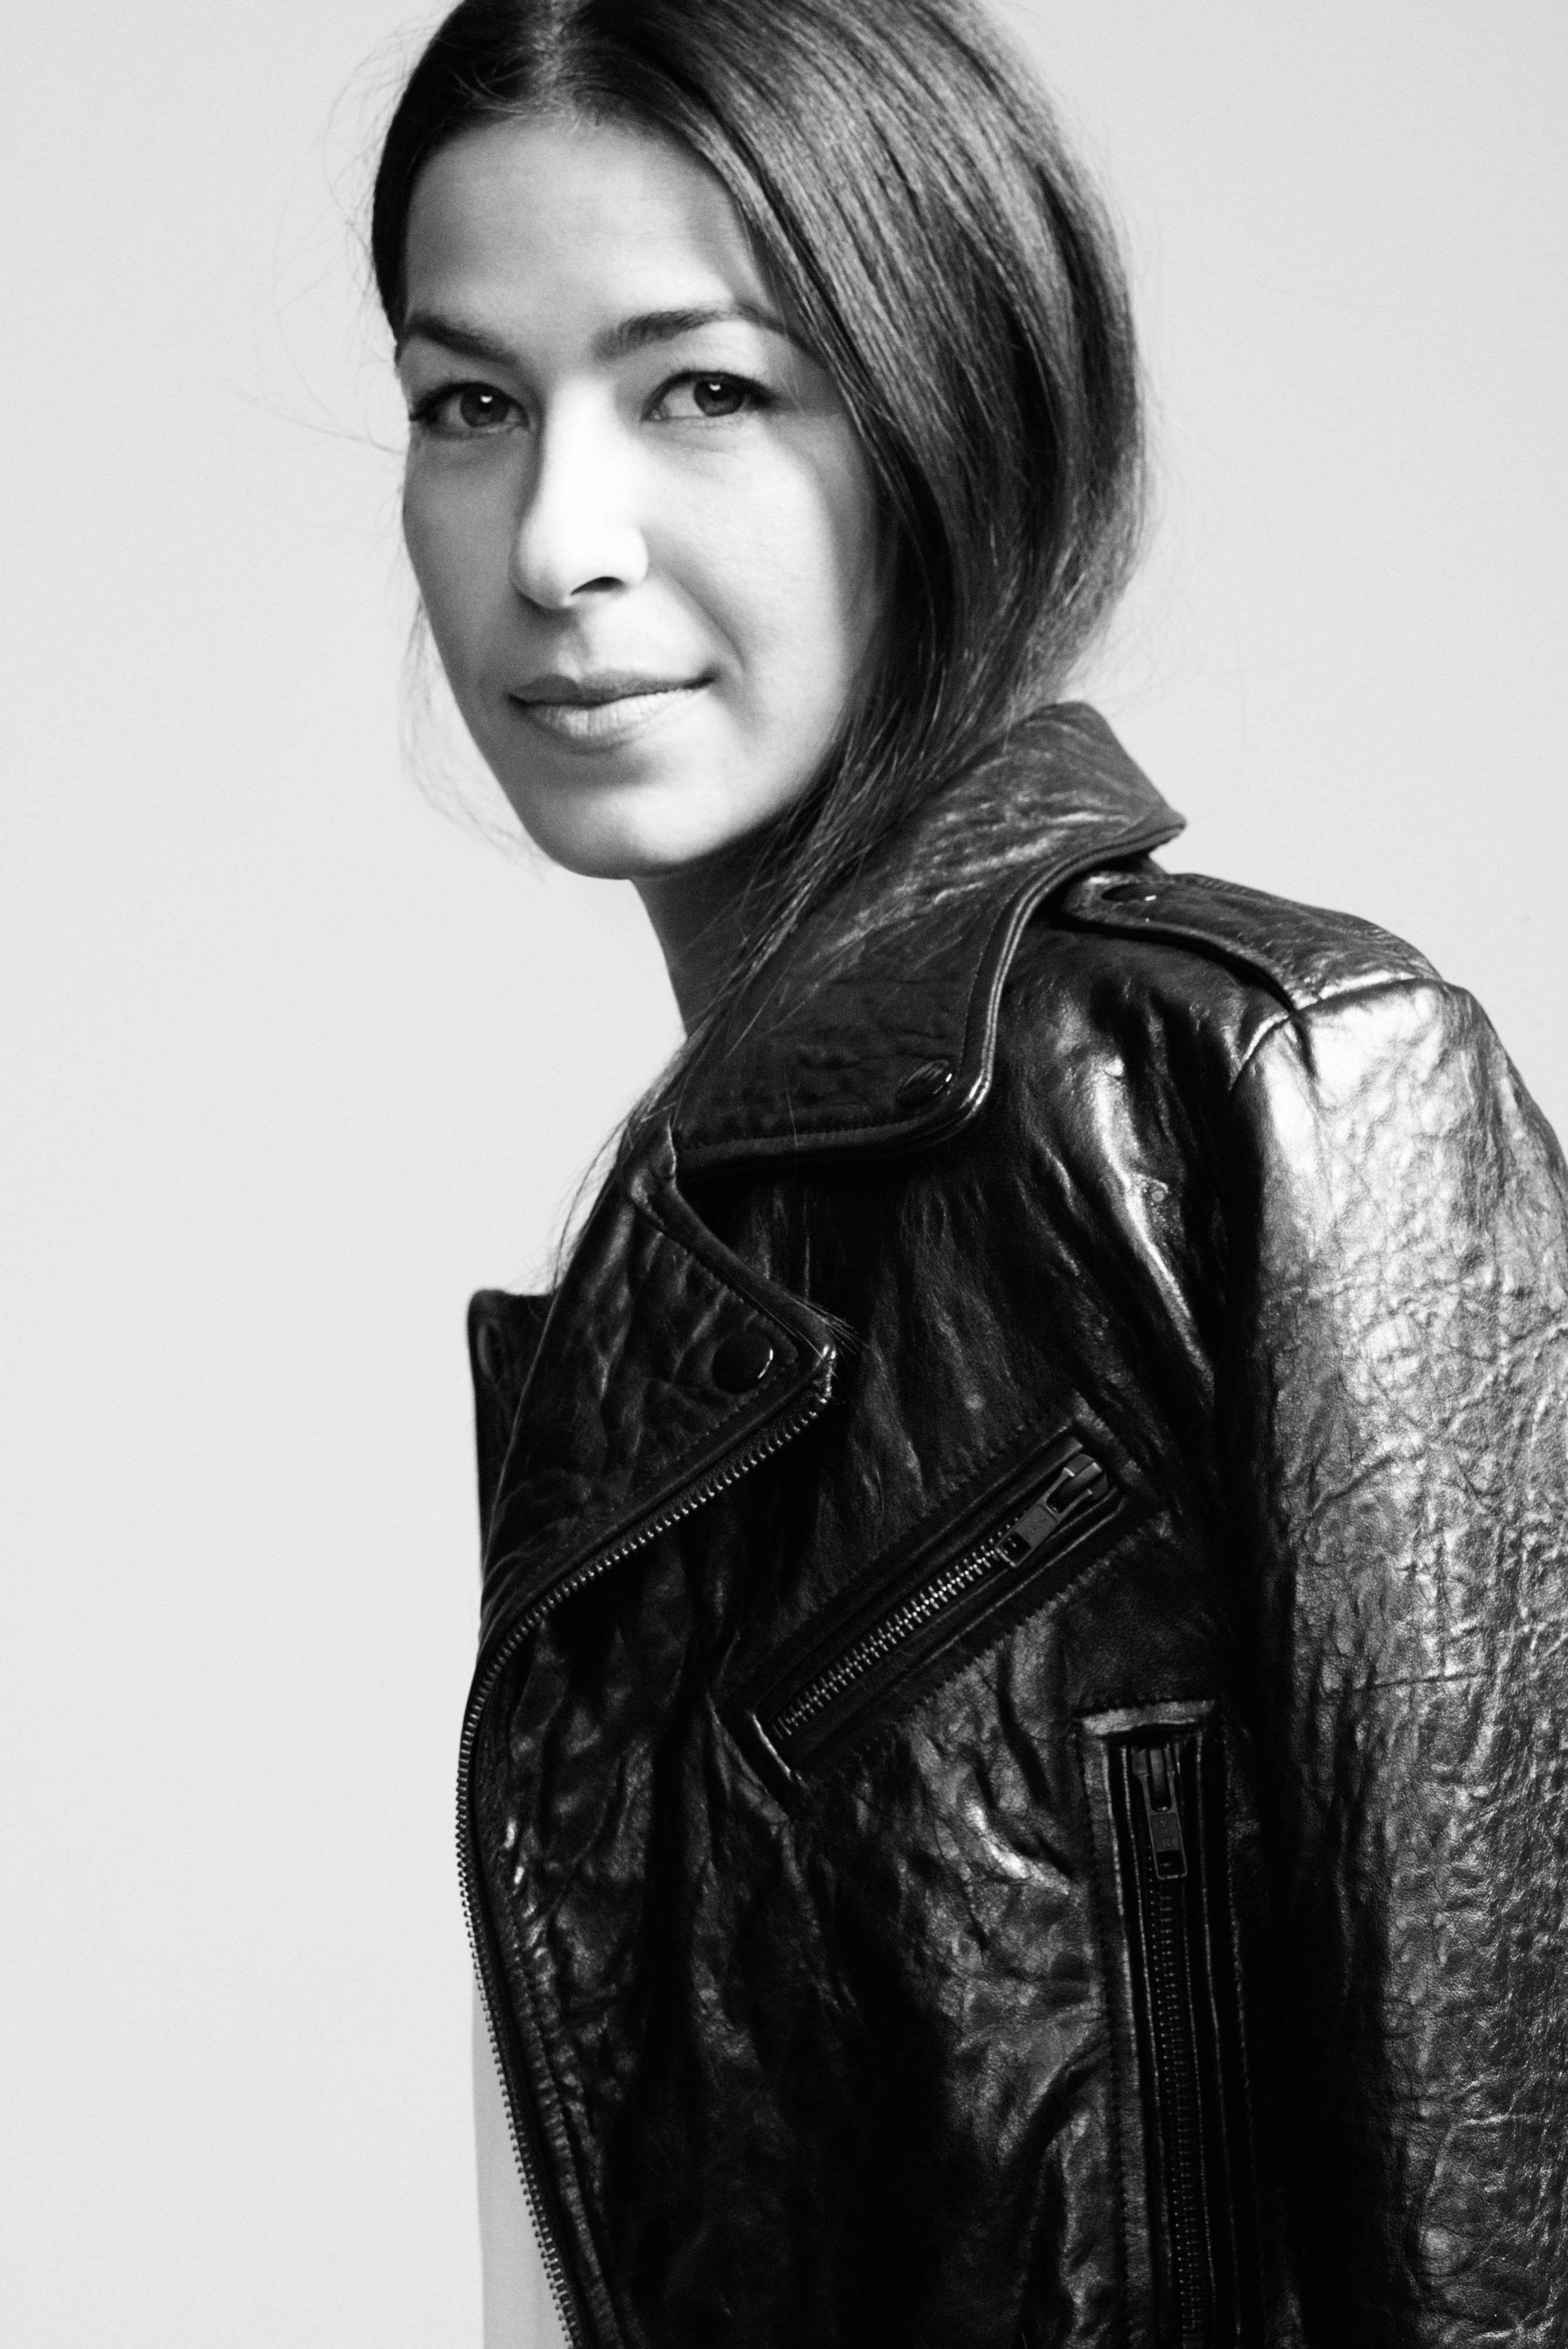 Rebecca Minkoff, Founder of Rebecca Minkoff